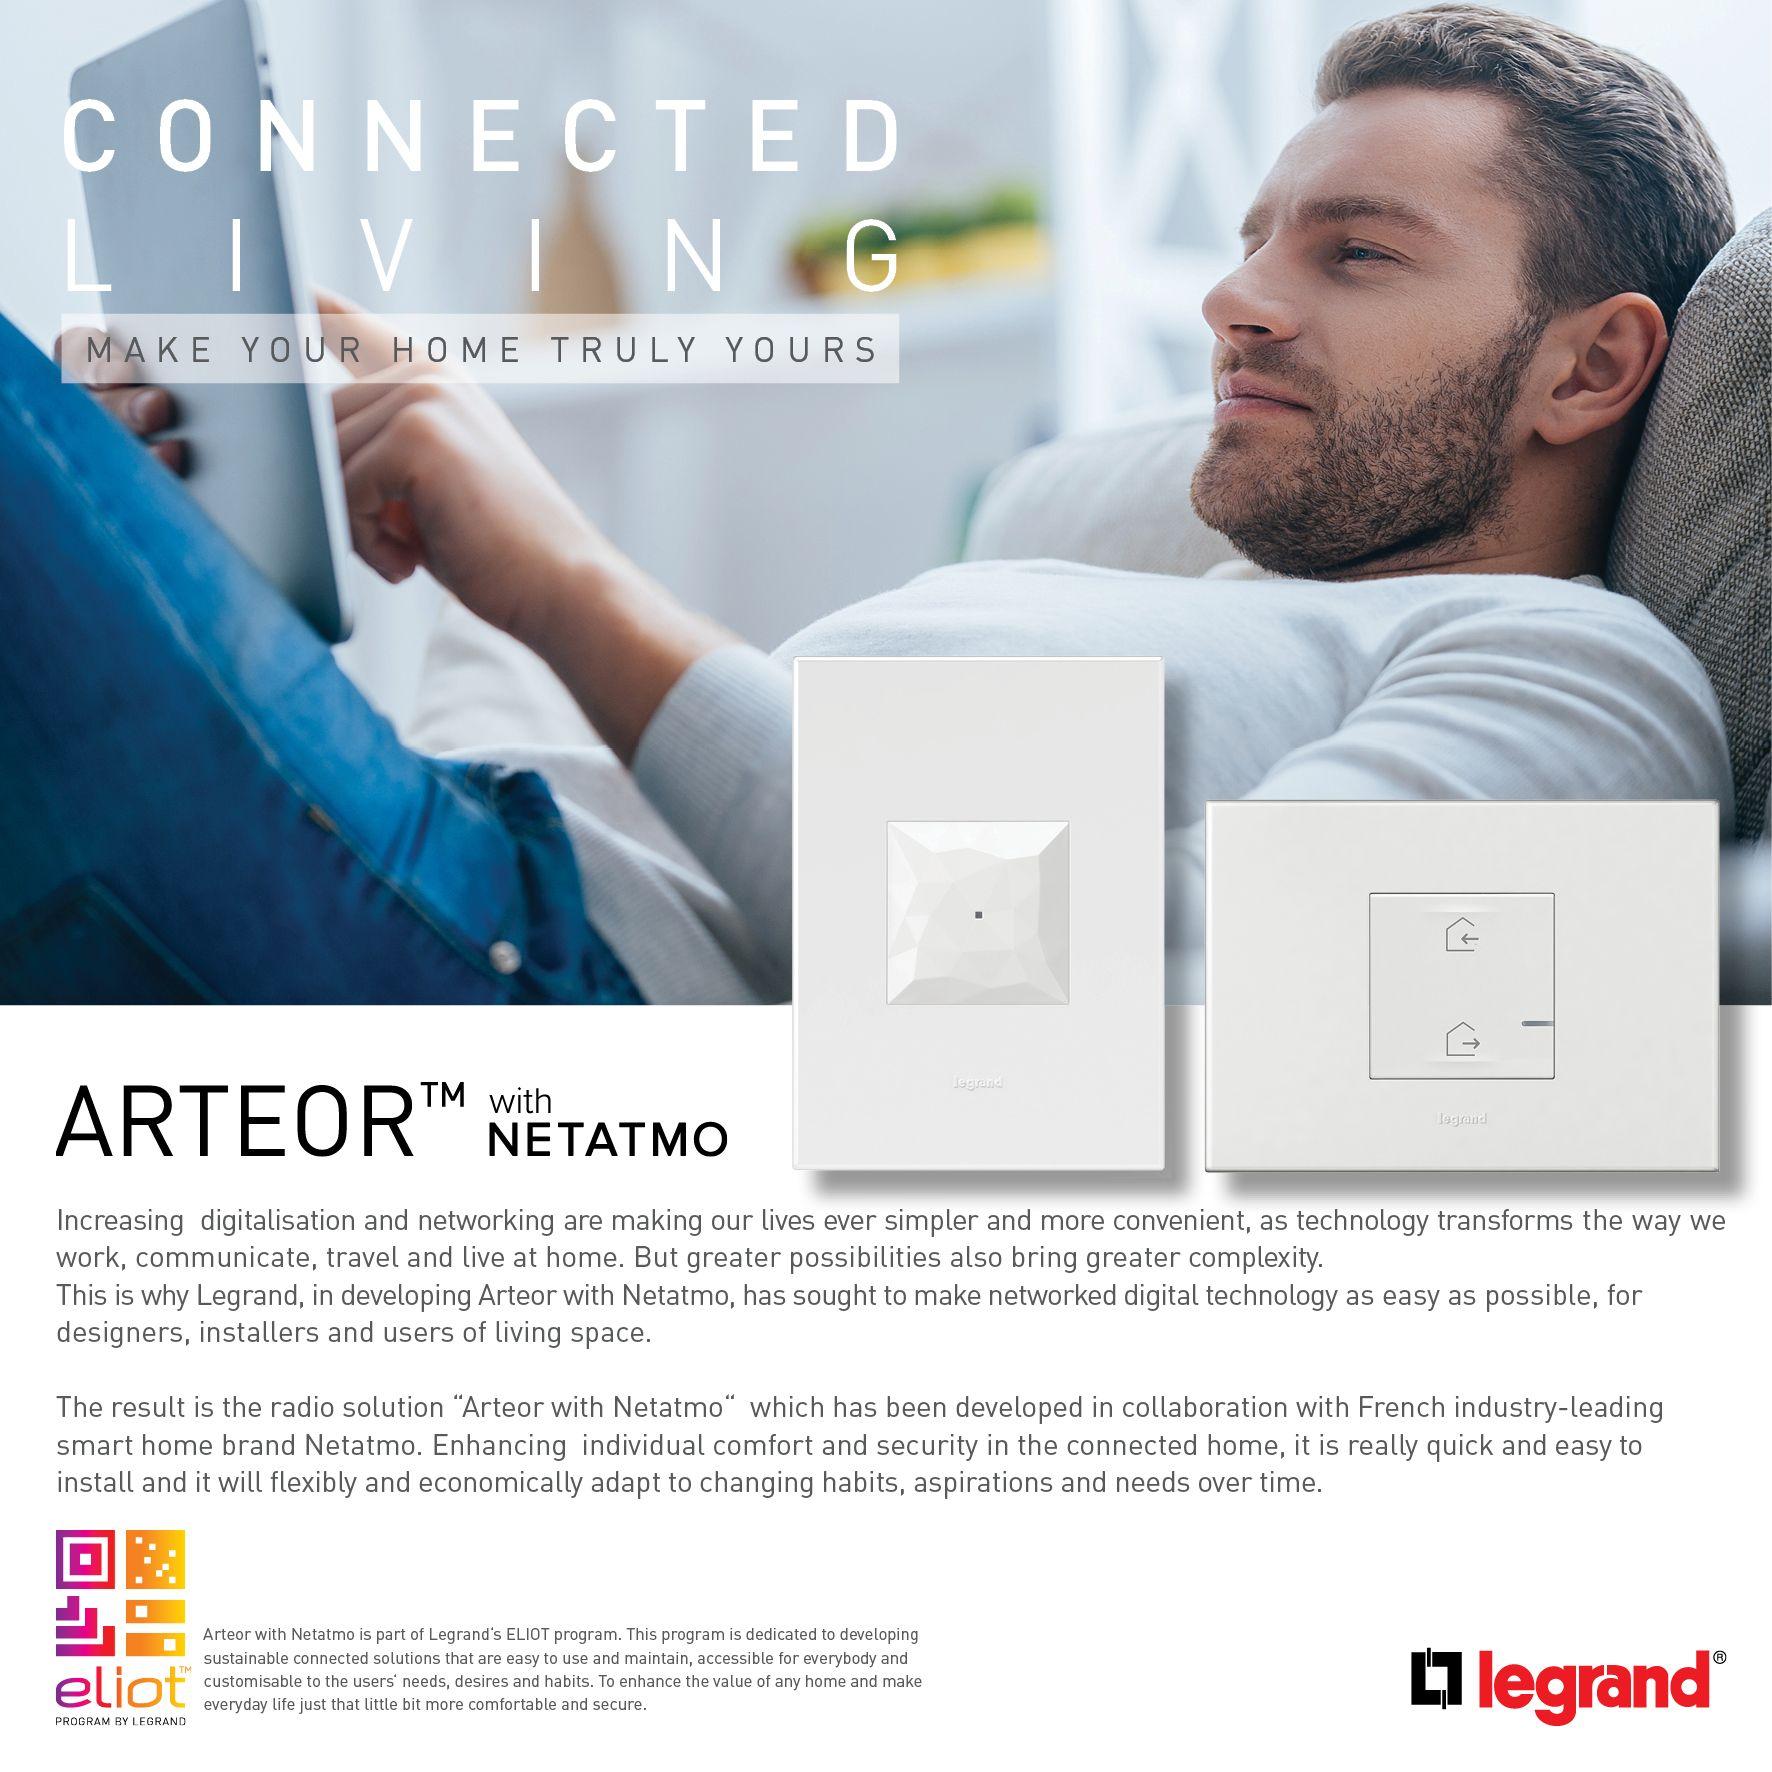 Arteor With Netatmo Enhances Individual Comfort And